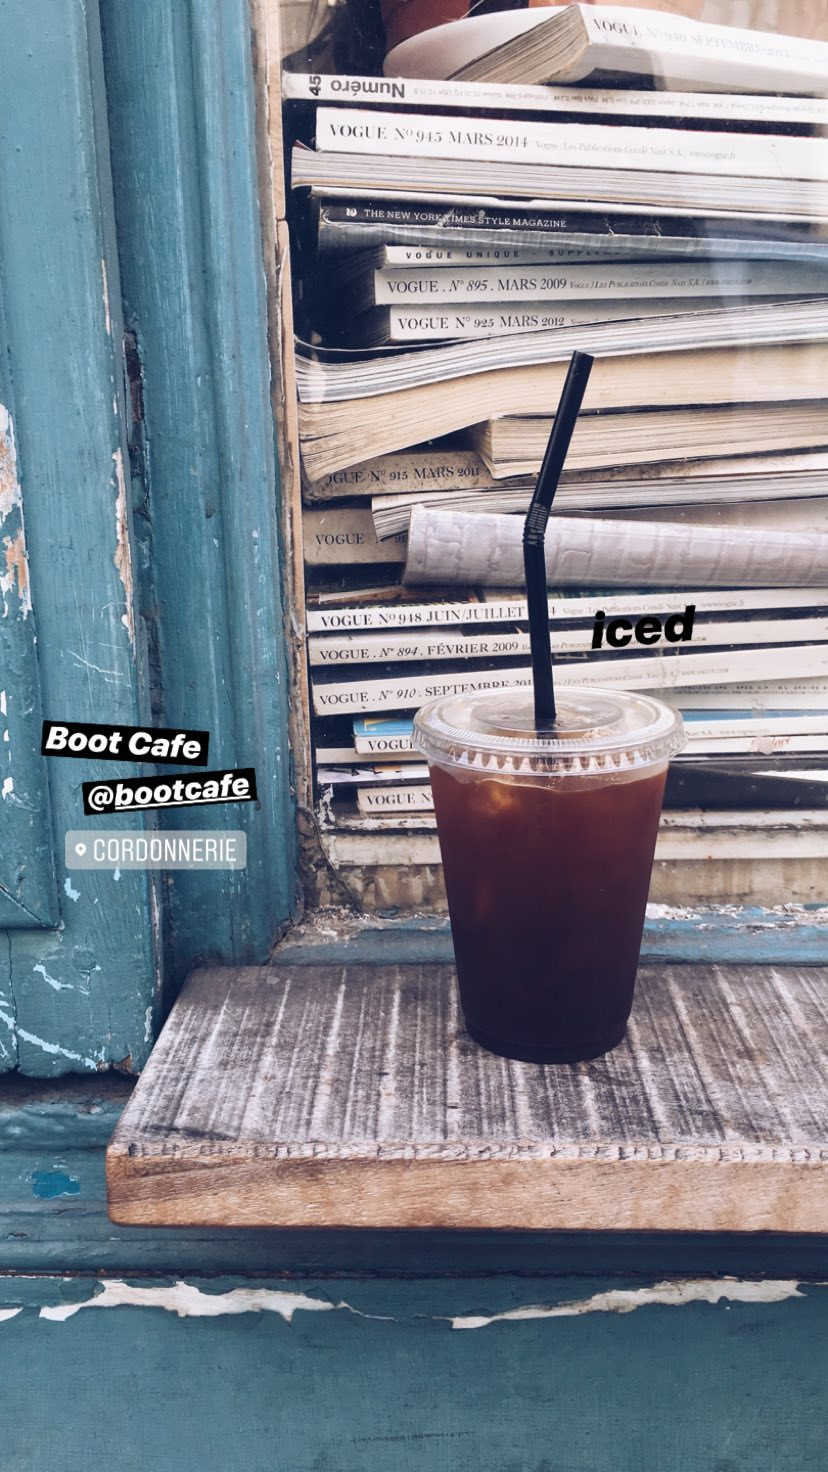 PARIS-FOOD-BOOTCAFE-COFFEE-4.jpg